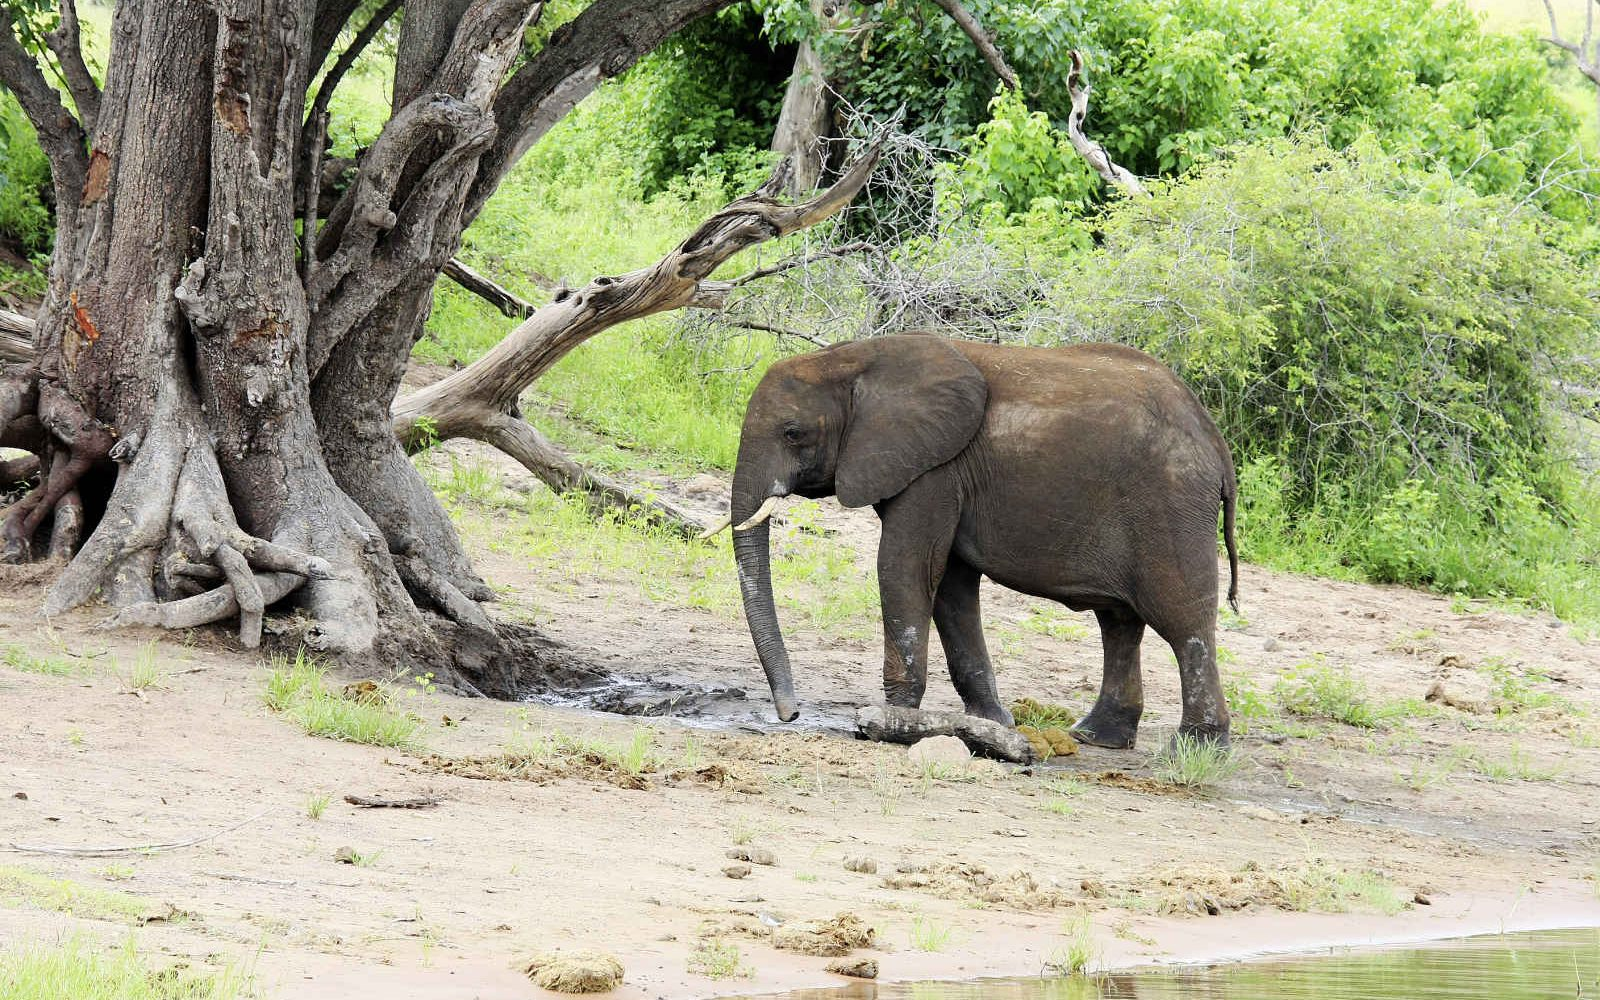 Jeune éléphant, Rivière Chobe, Botswana